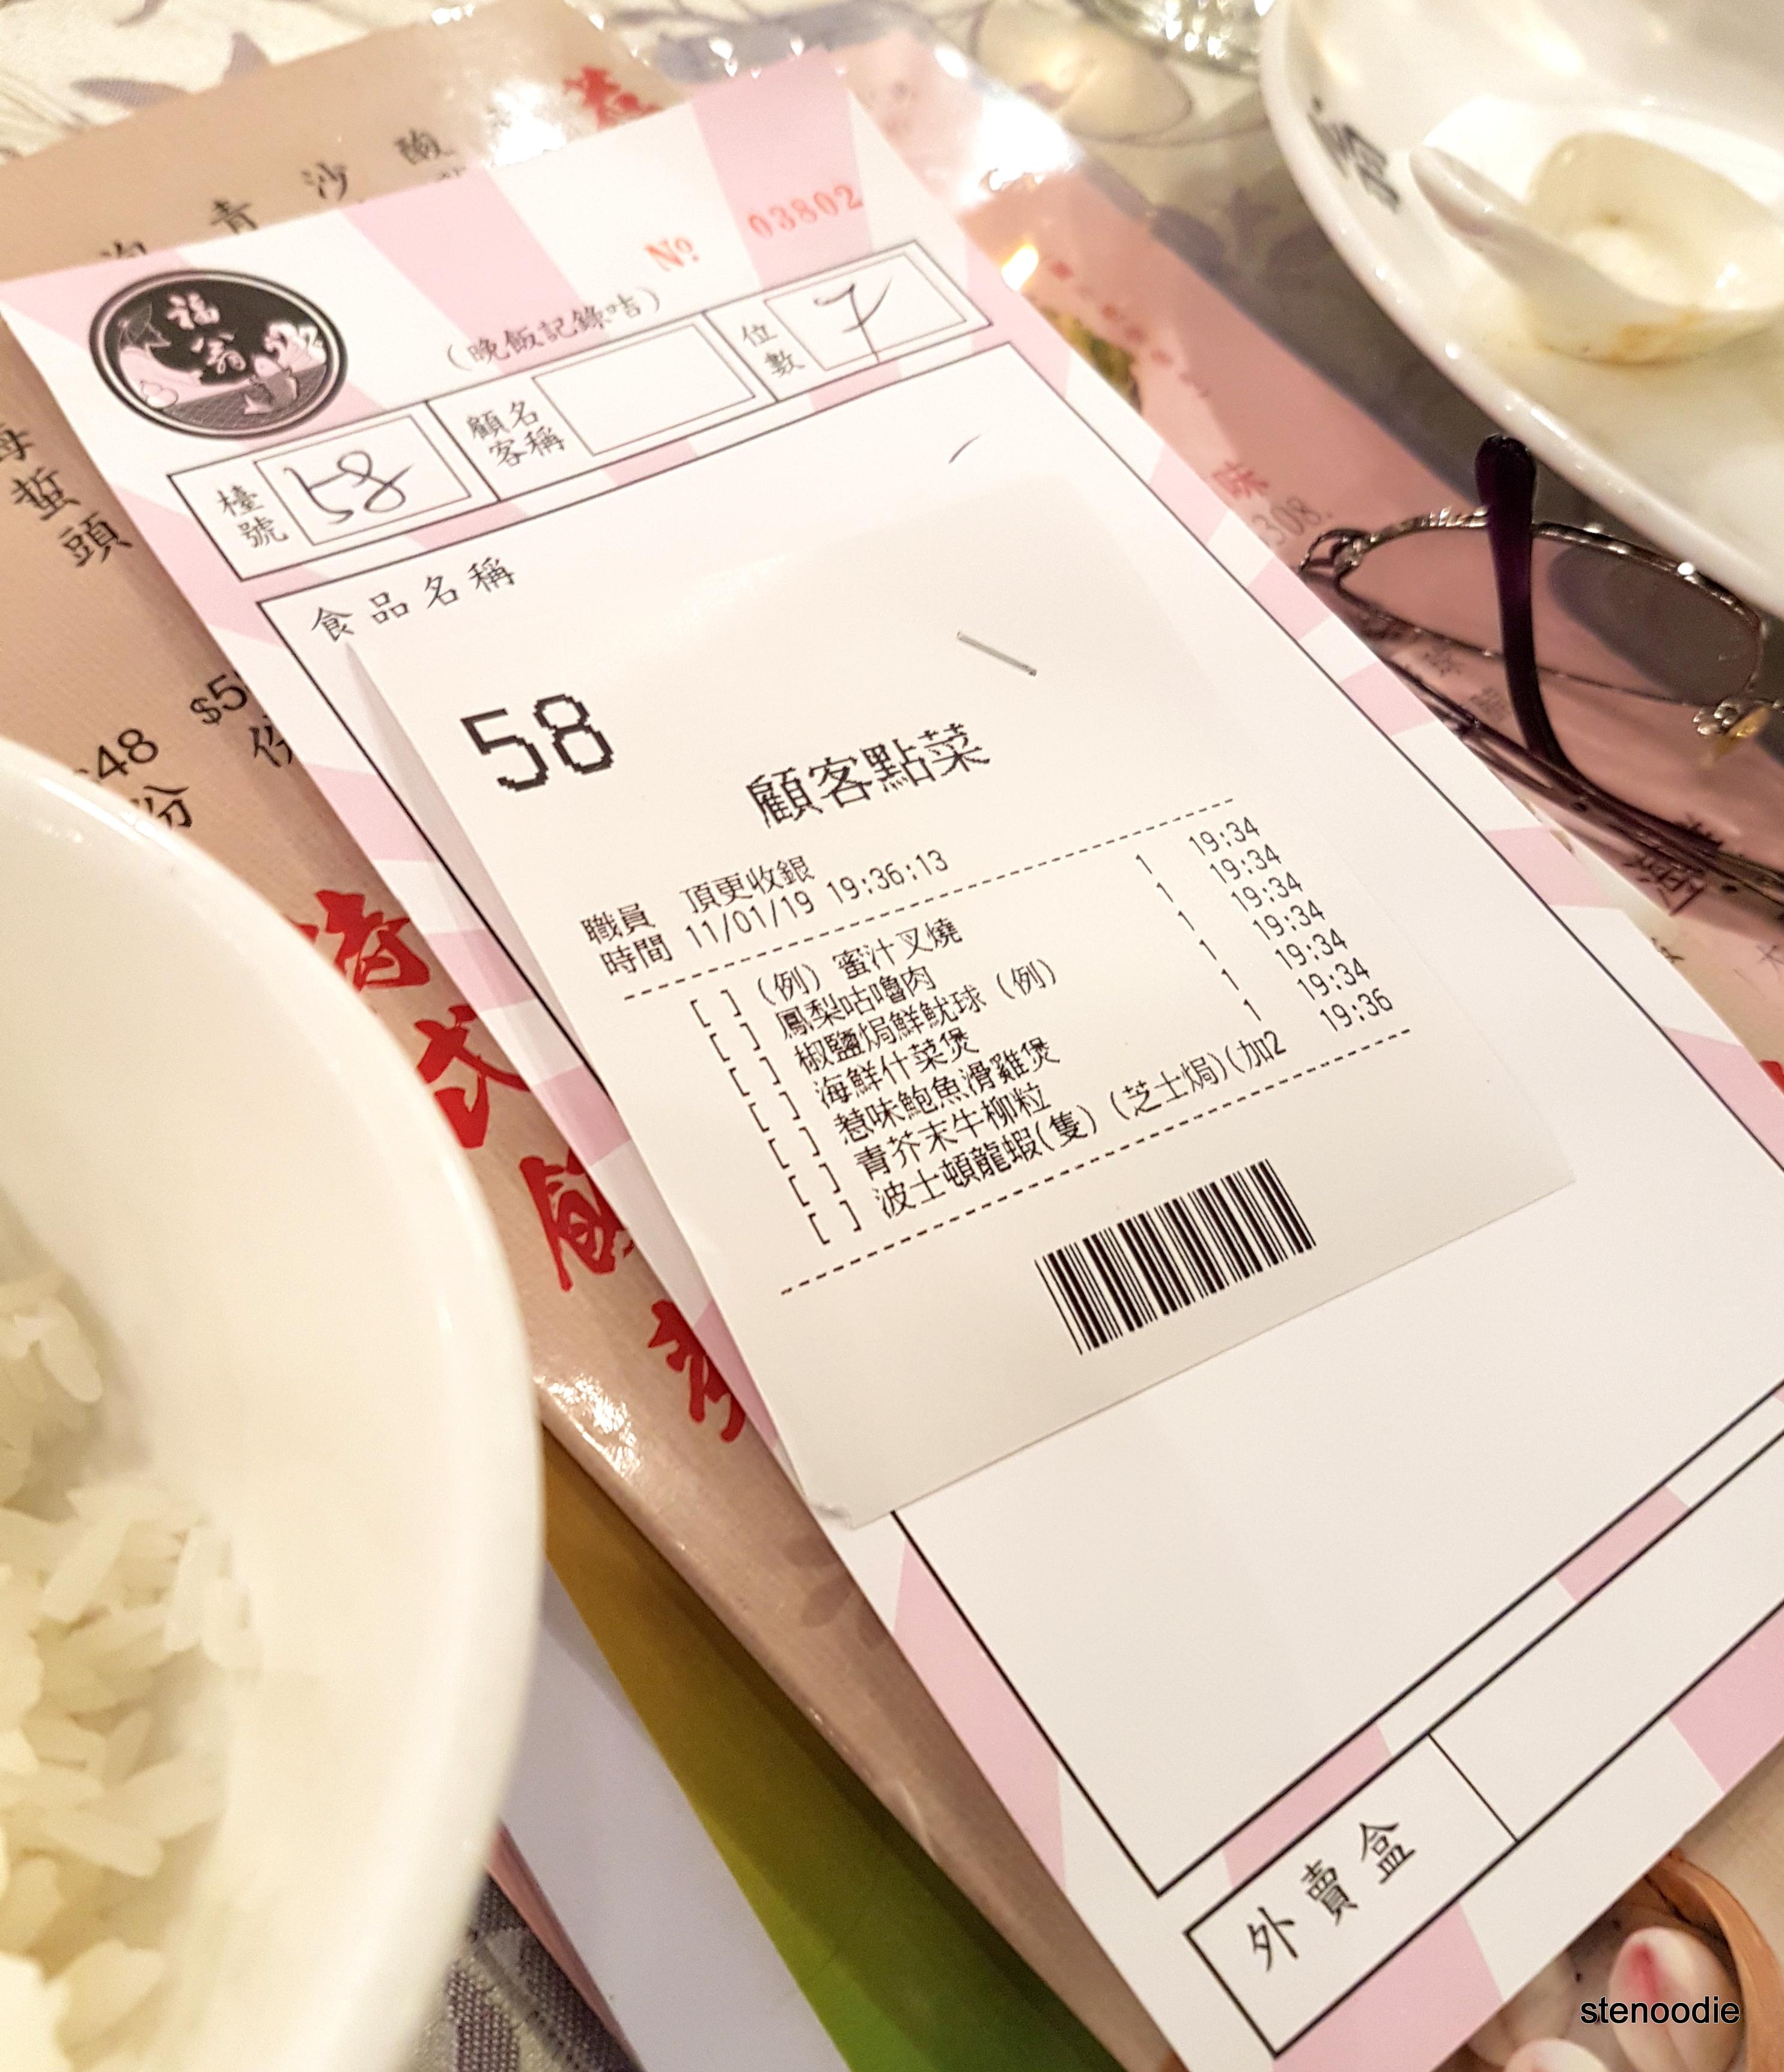 Fu Weng Seafood Restaurant receipt